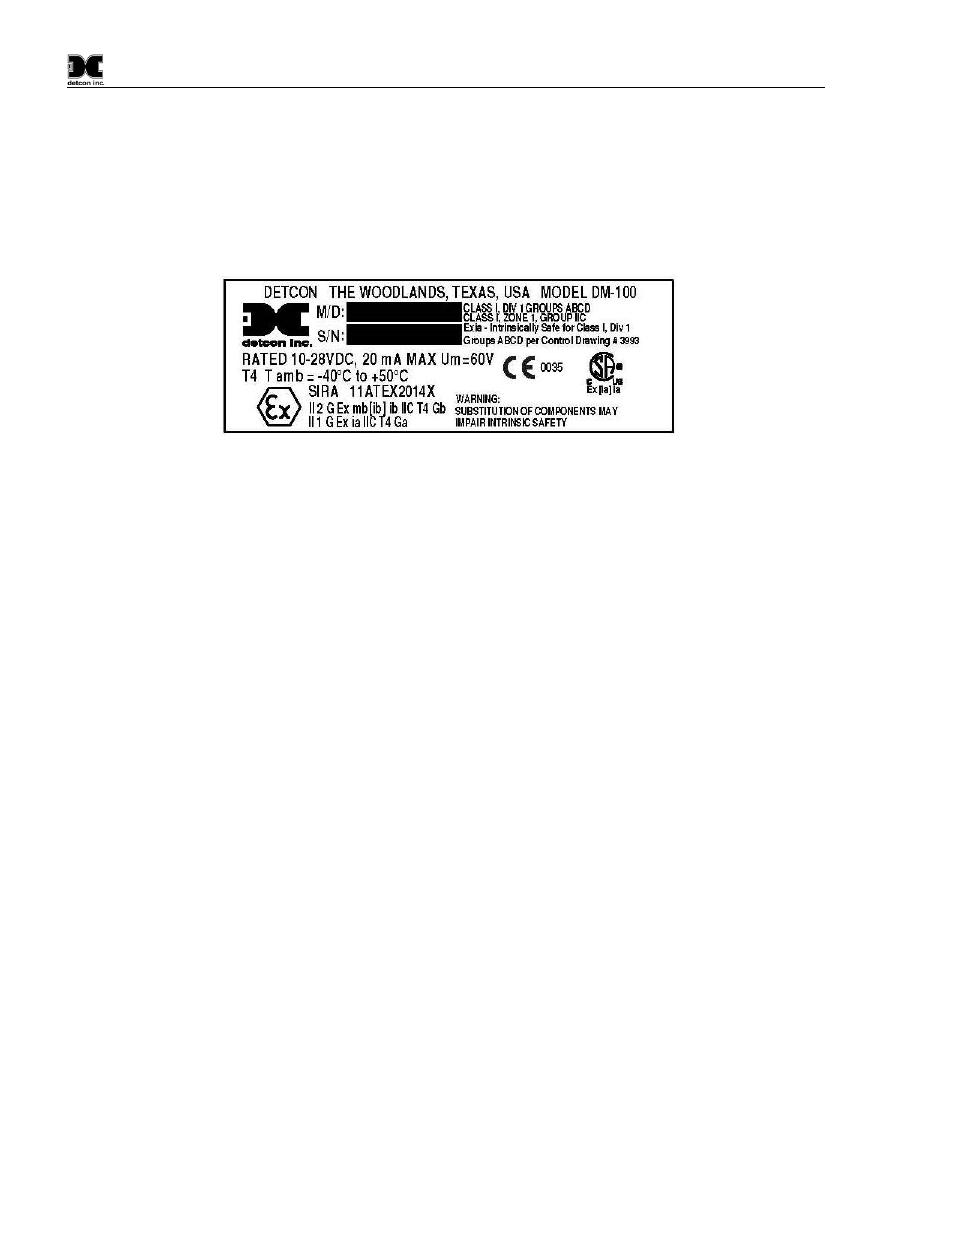 Installation, Figure 10 approval label | Detcon DM-100 User